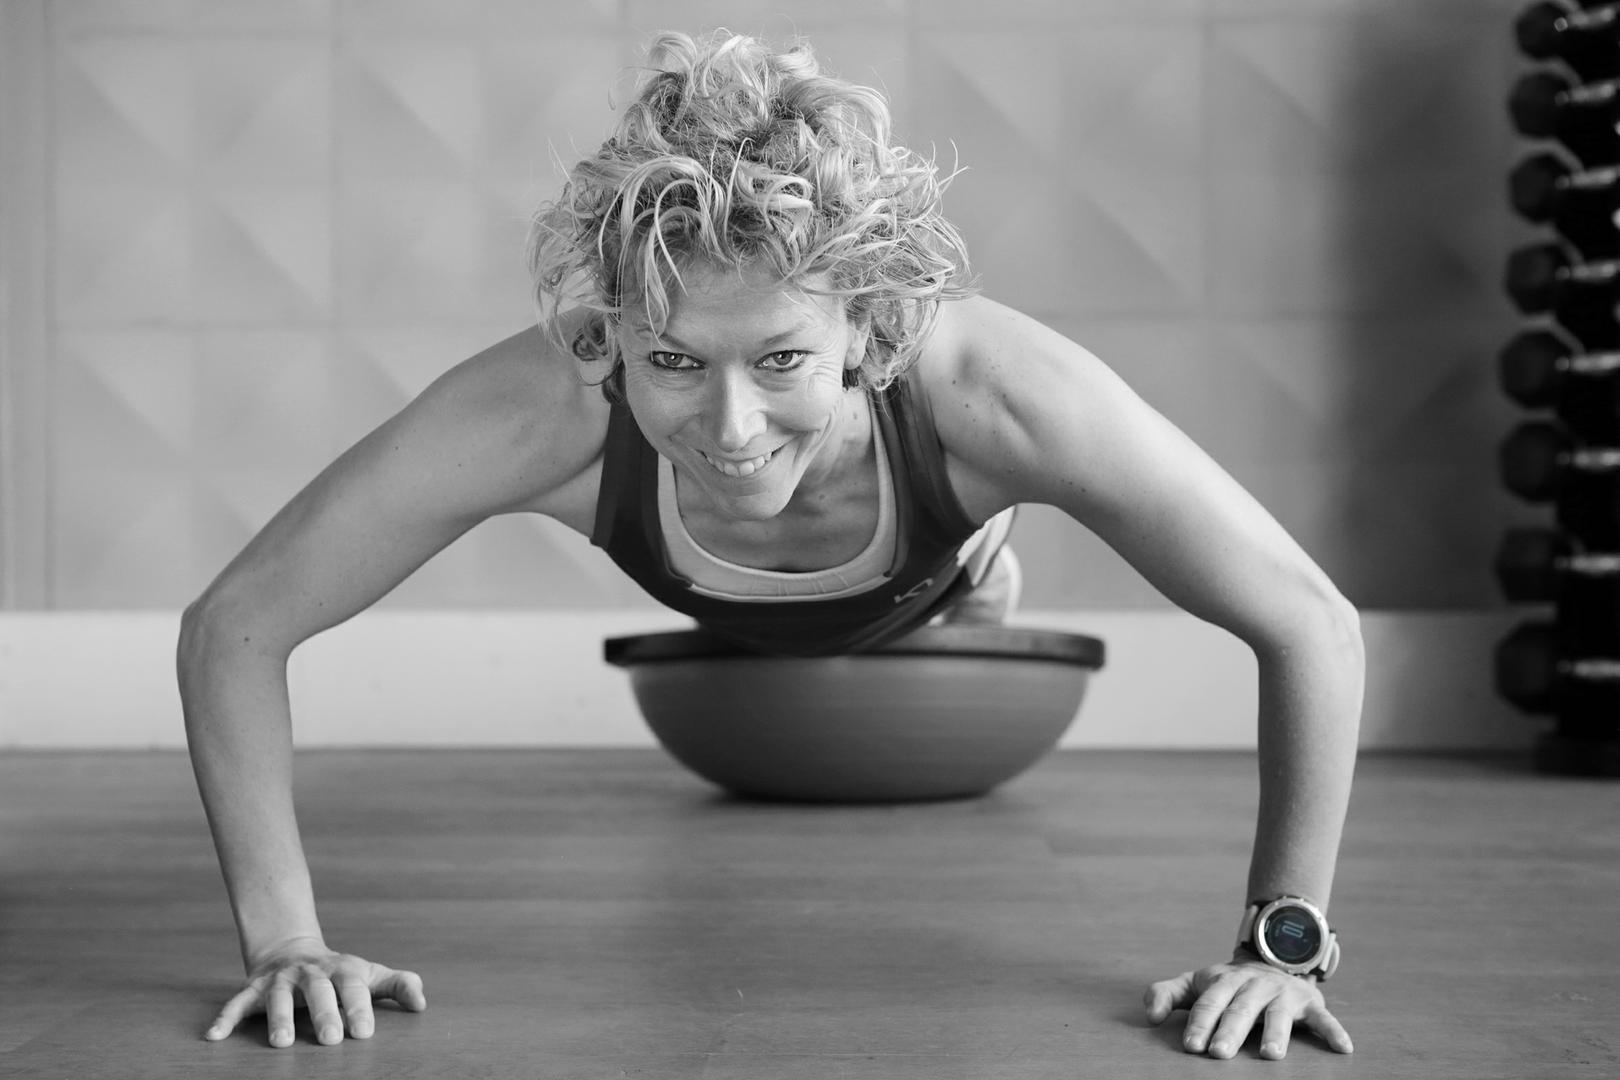 groepstraining_dames_training_fitness_health_body_bodybulding_arnold_club_landgraaf_landgraaf_triggerz_roy_google_heerlen_geleen_sporten